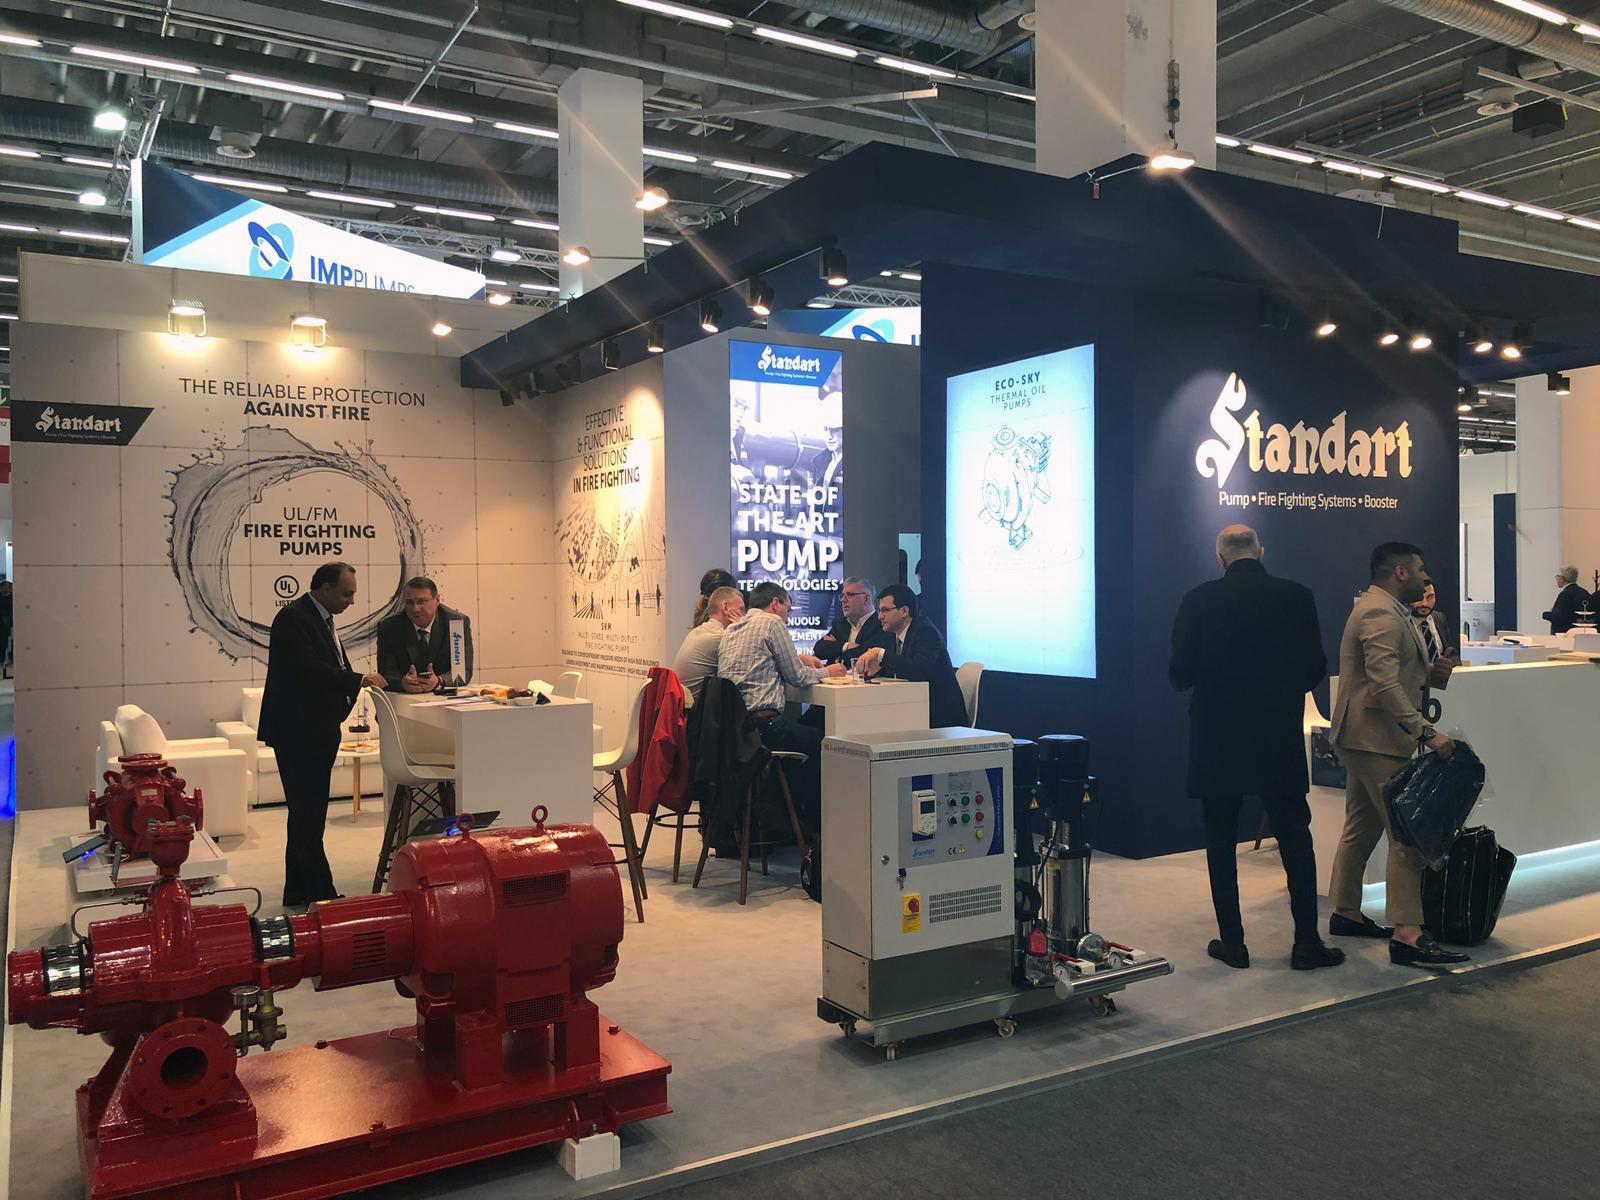 Standart Pompa, ISH Frankfurt 2019'daydı